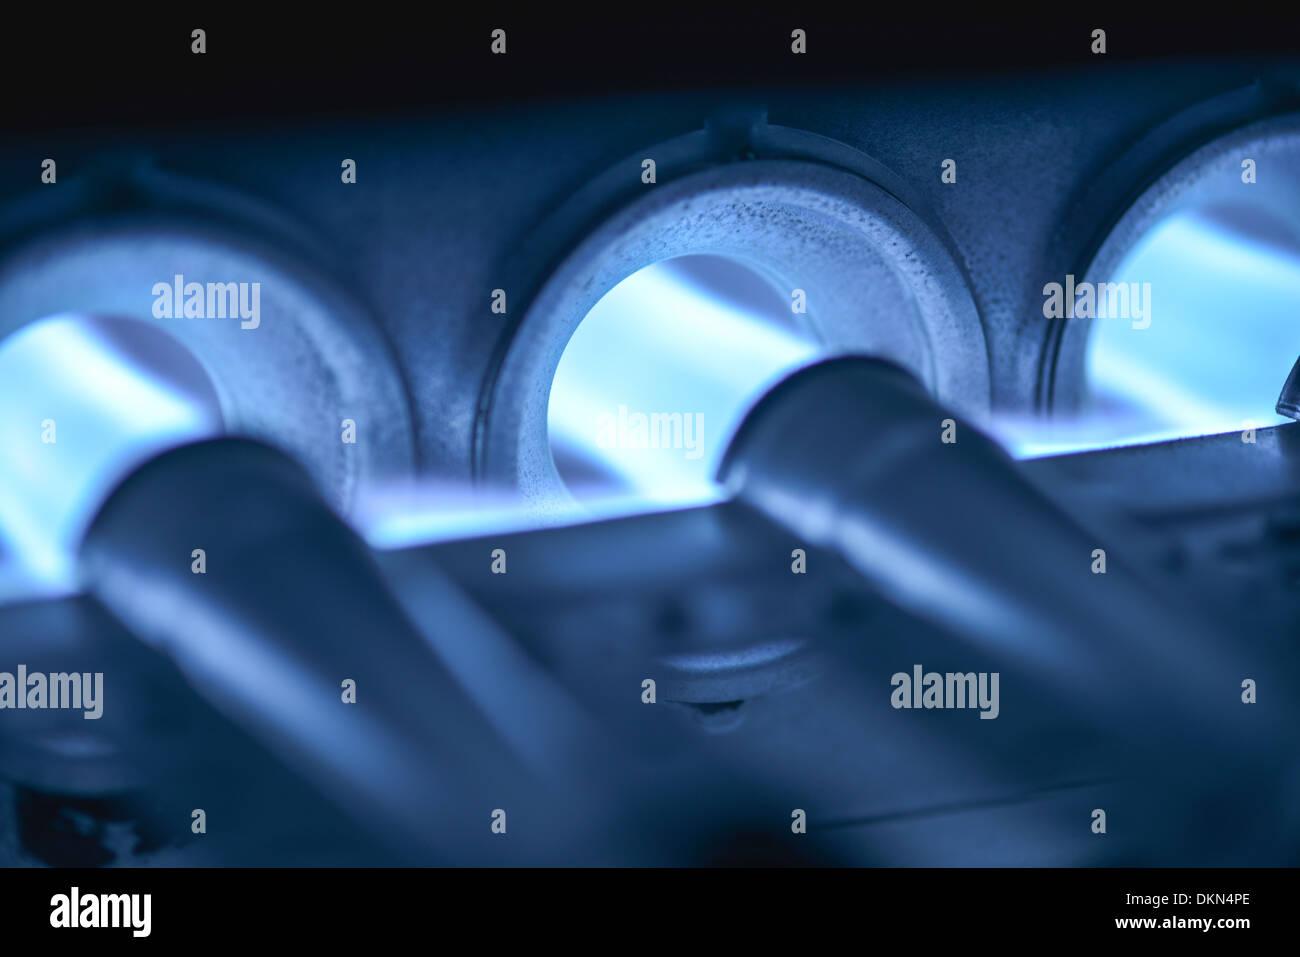 Power Concept - Closeup Shot Of Home Furnace Burner Ignited - Stock Image